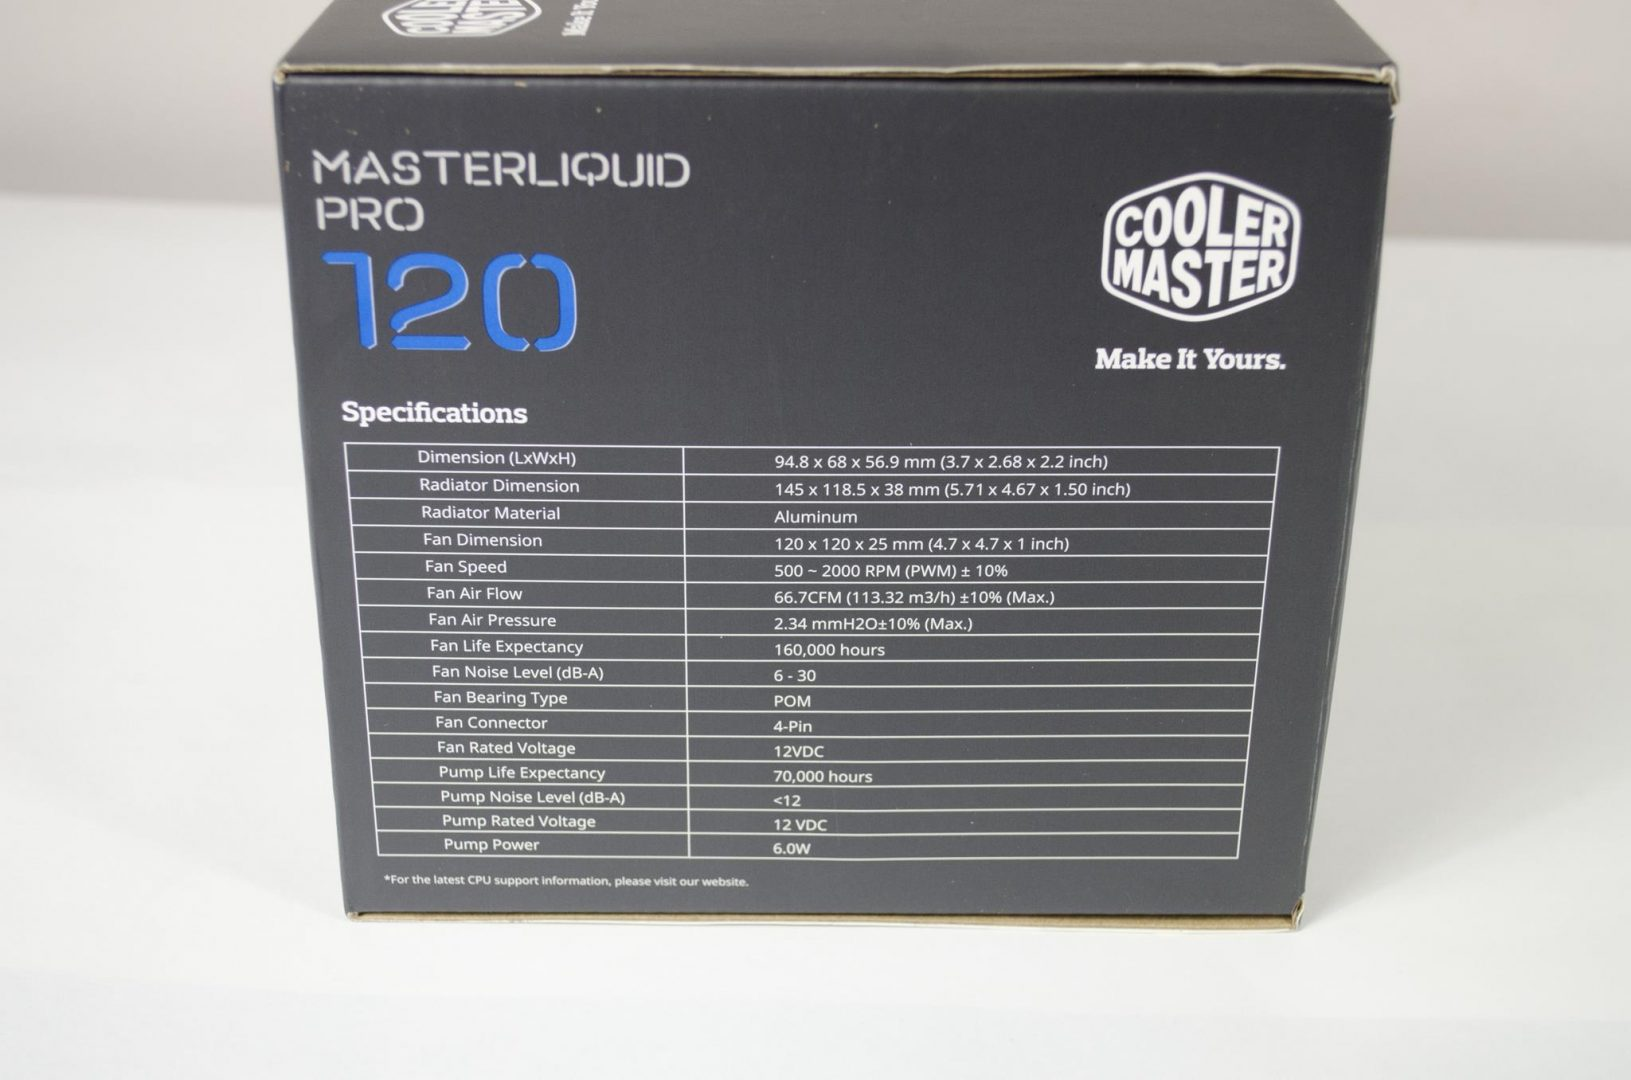 cooler-master-masterliuqid-pro-120_1